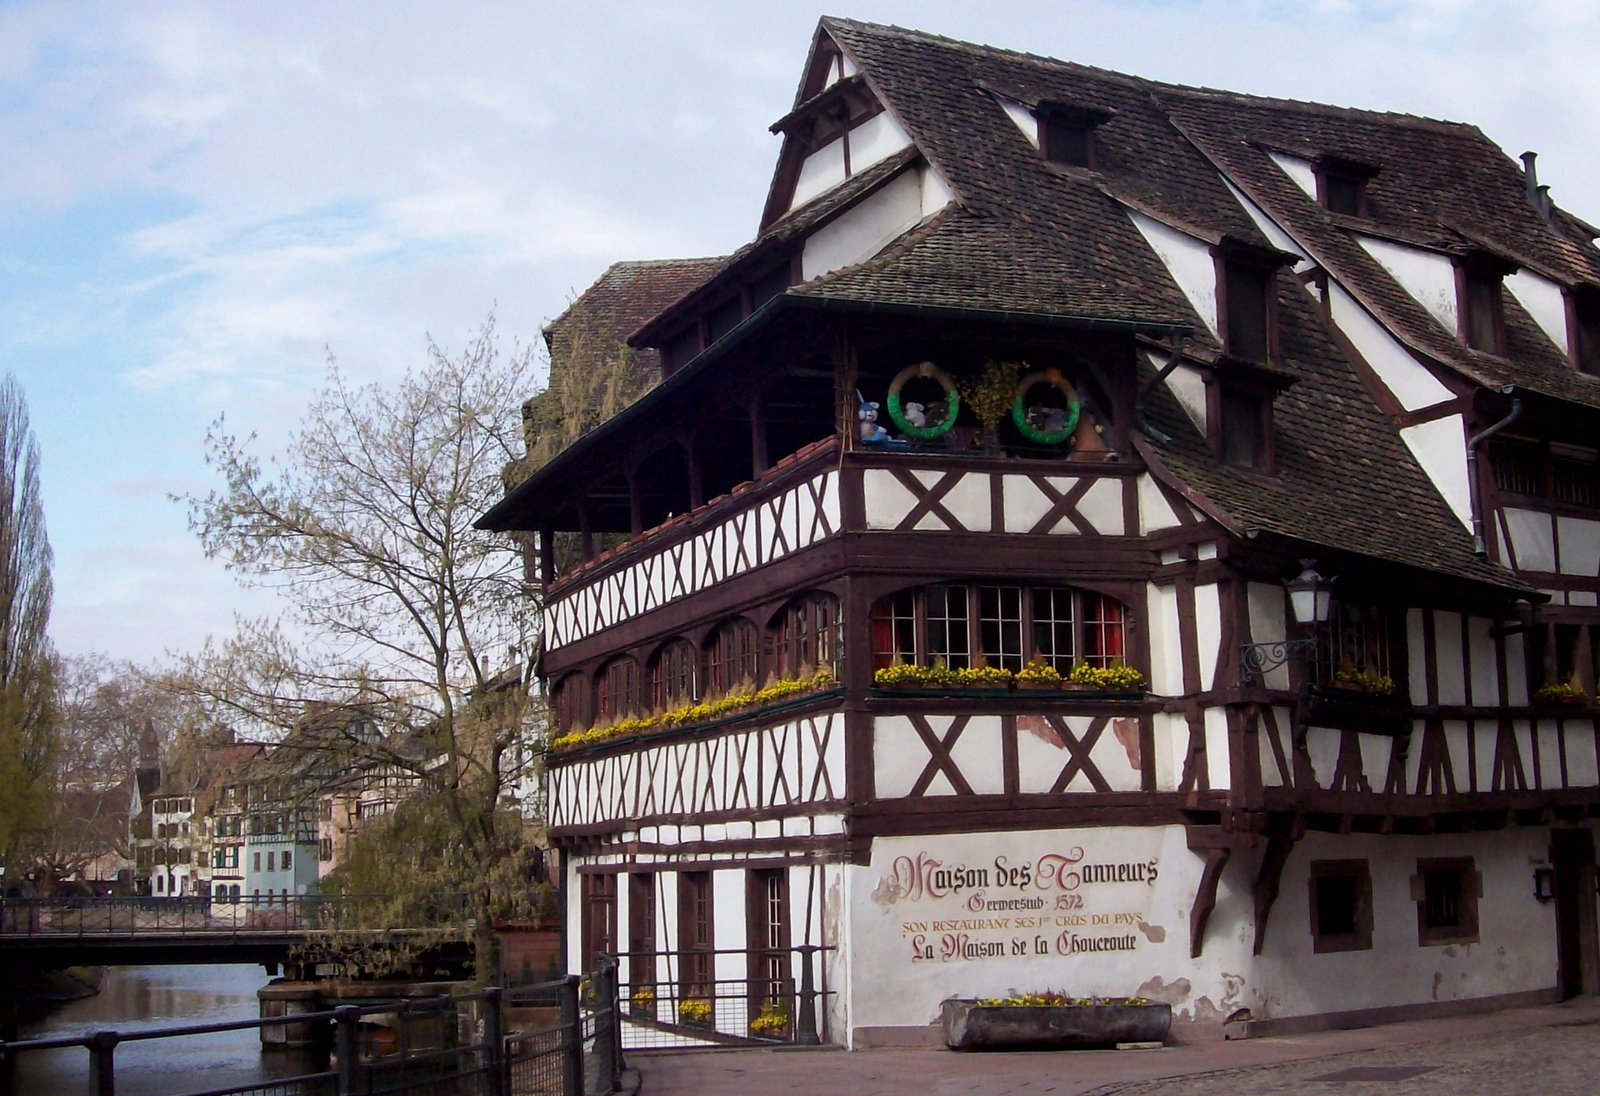 Gerwerstub Straßburg